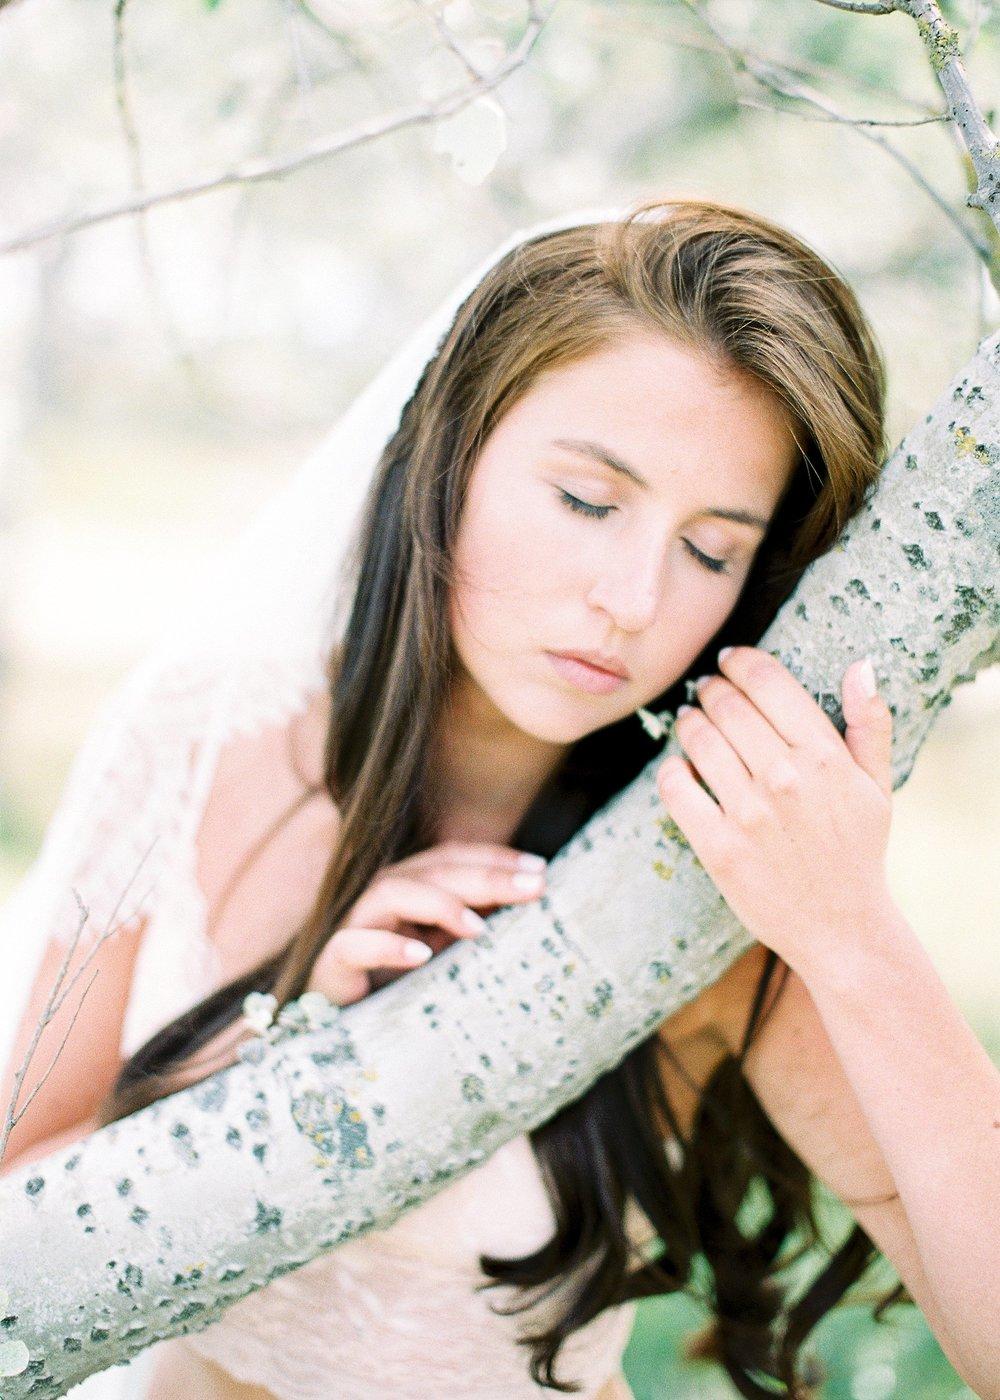 Amanda-Drost-Photography-Fine-Art-Nederland00001.jpg